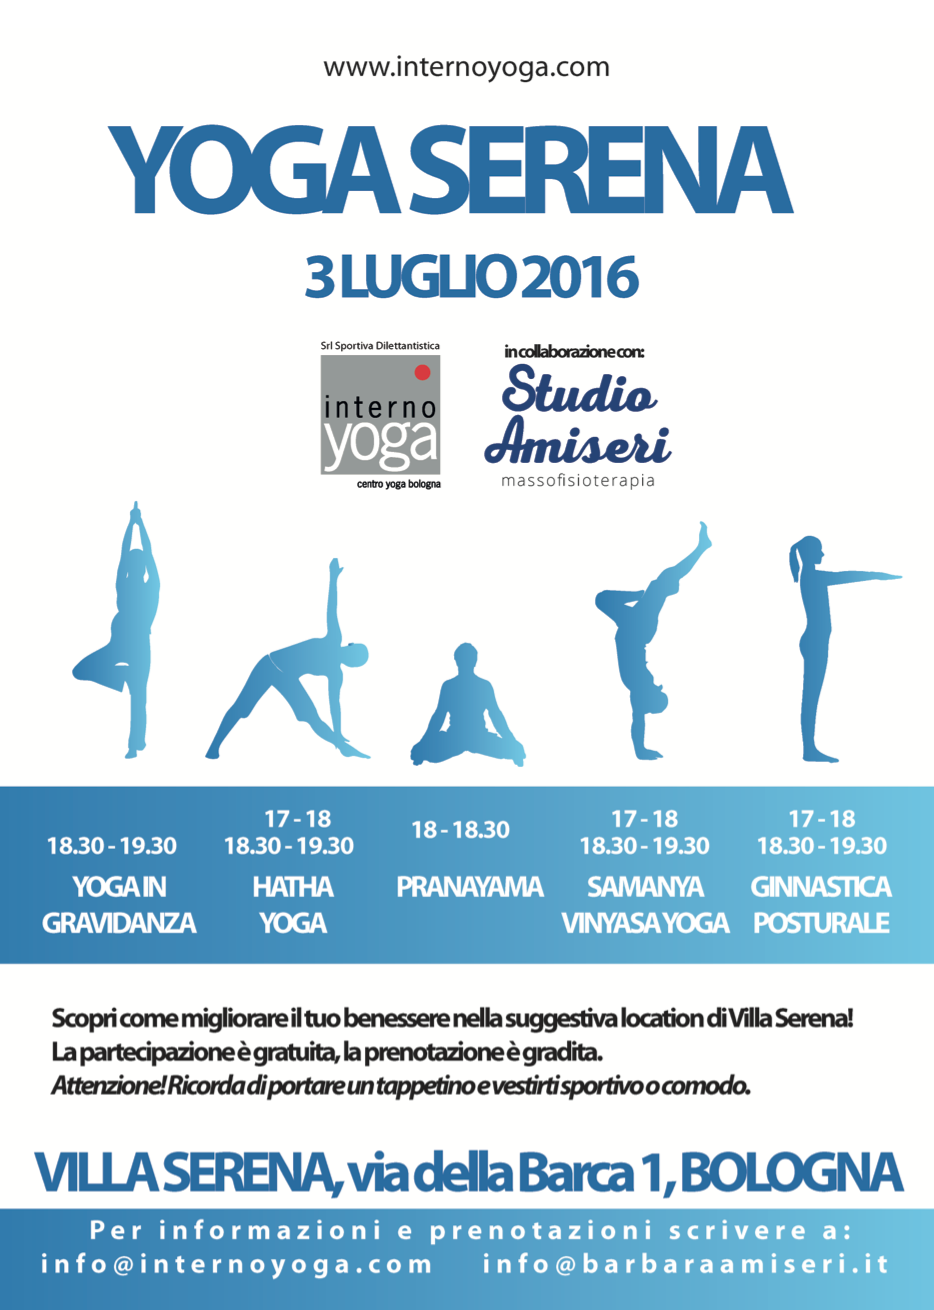 Yoga Serena internoyoga studio amiseri